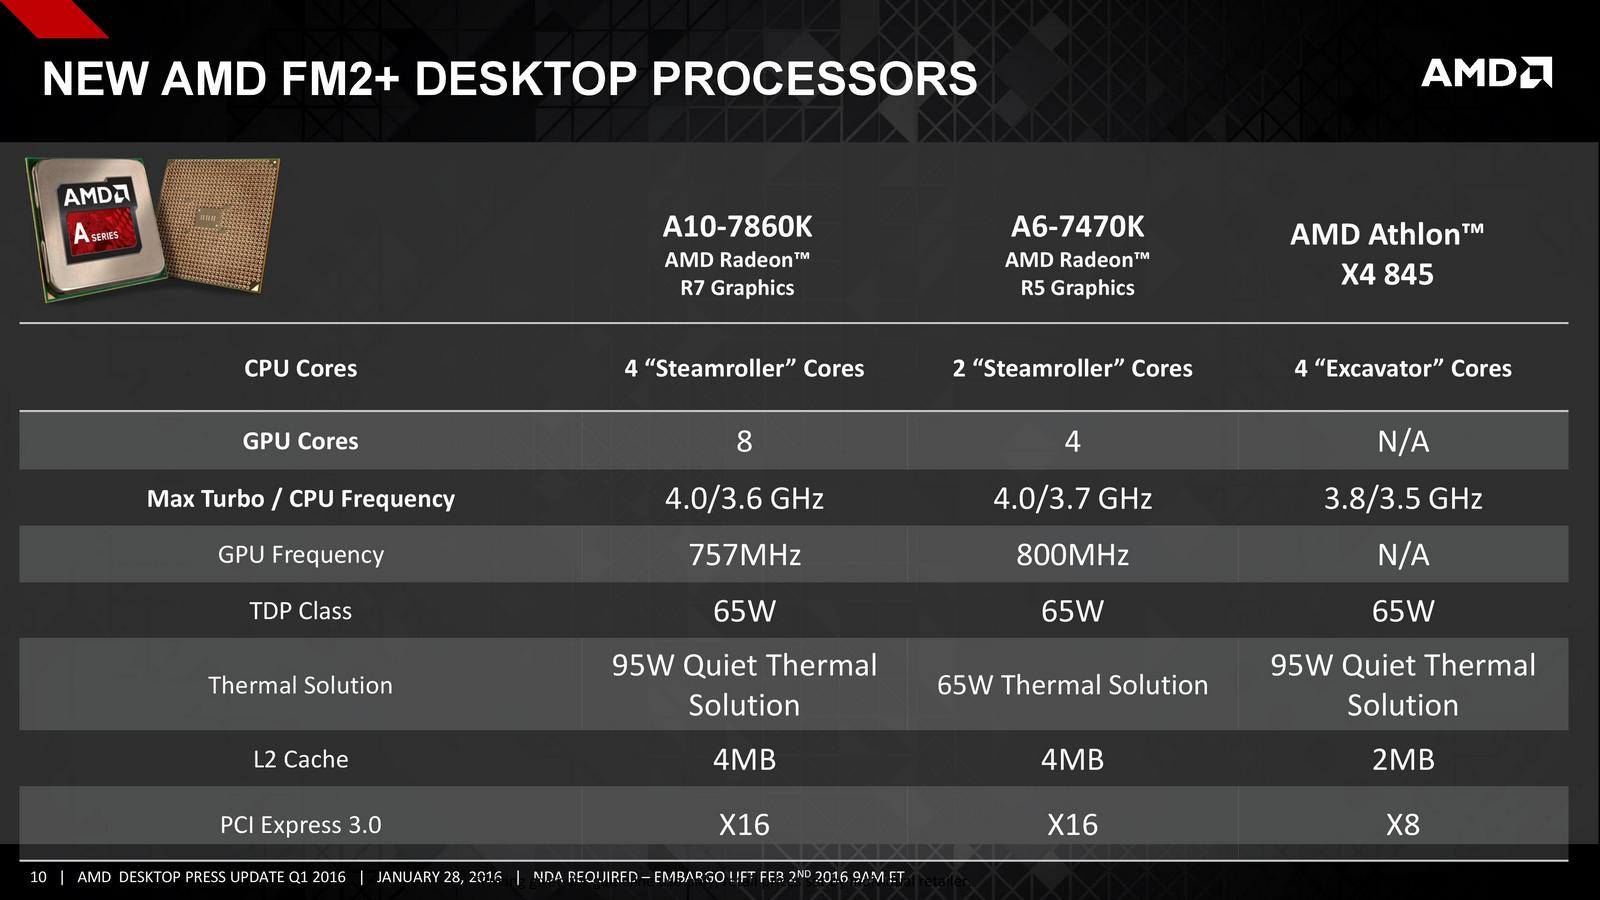 AMD also announces new Athlon X4 845 United States $70 CPU